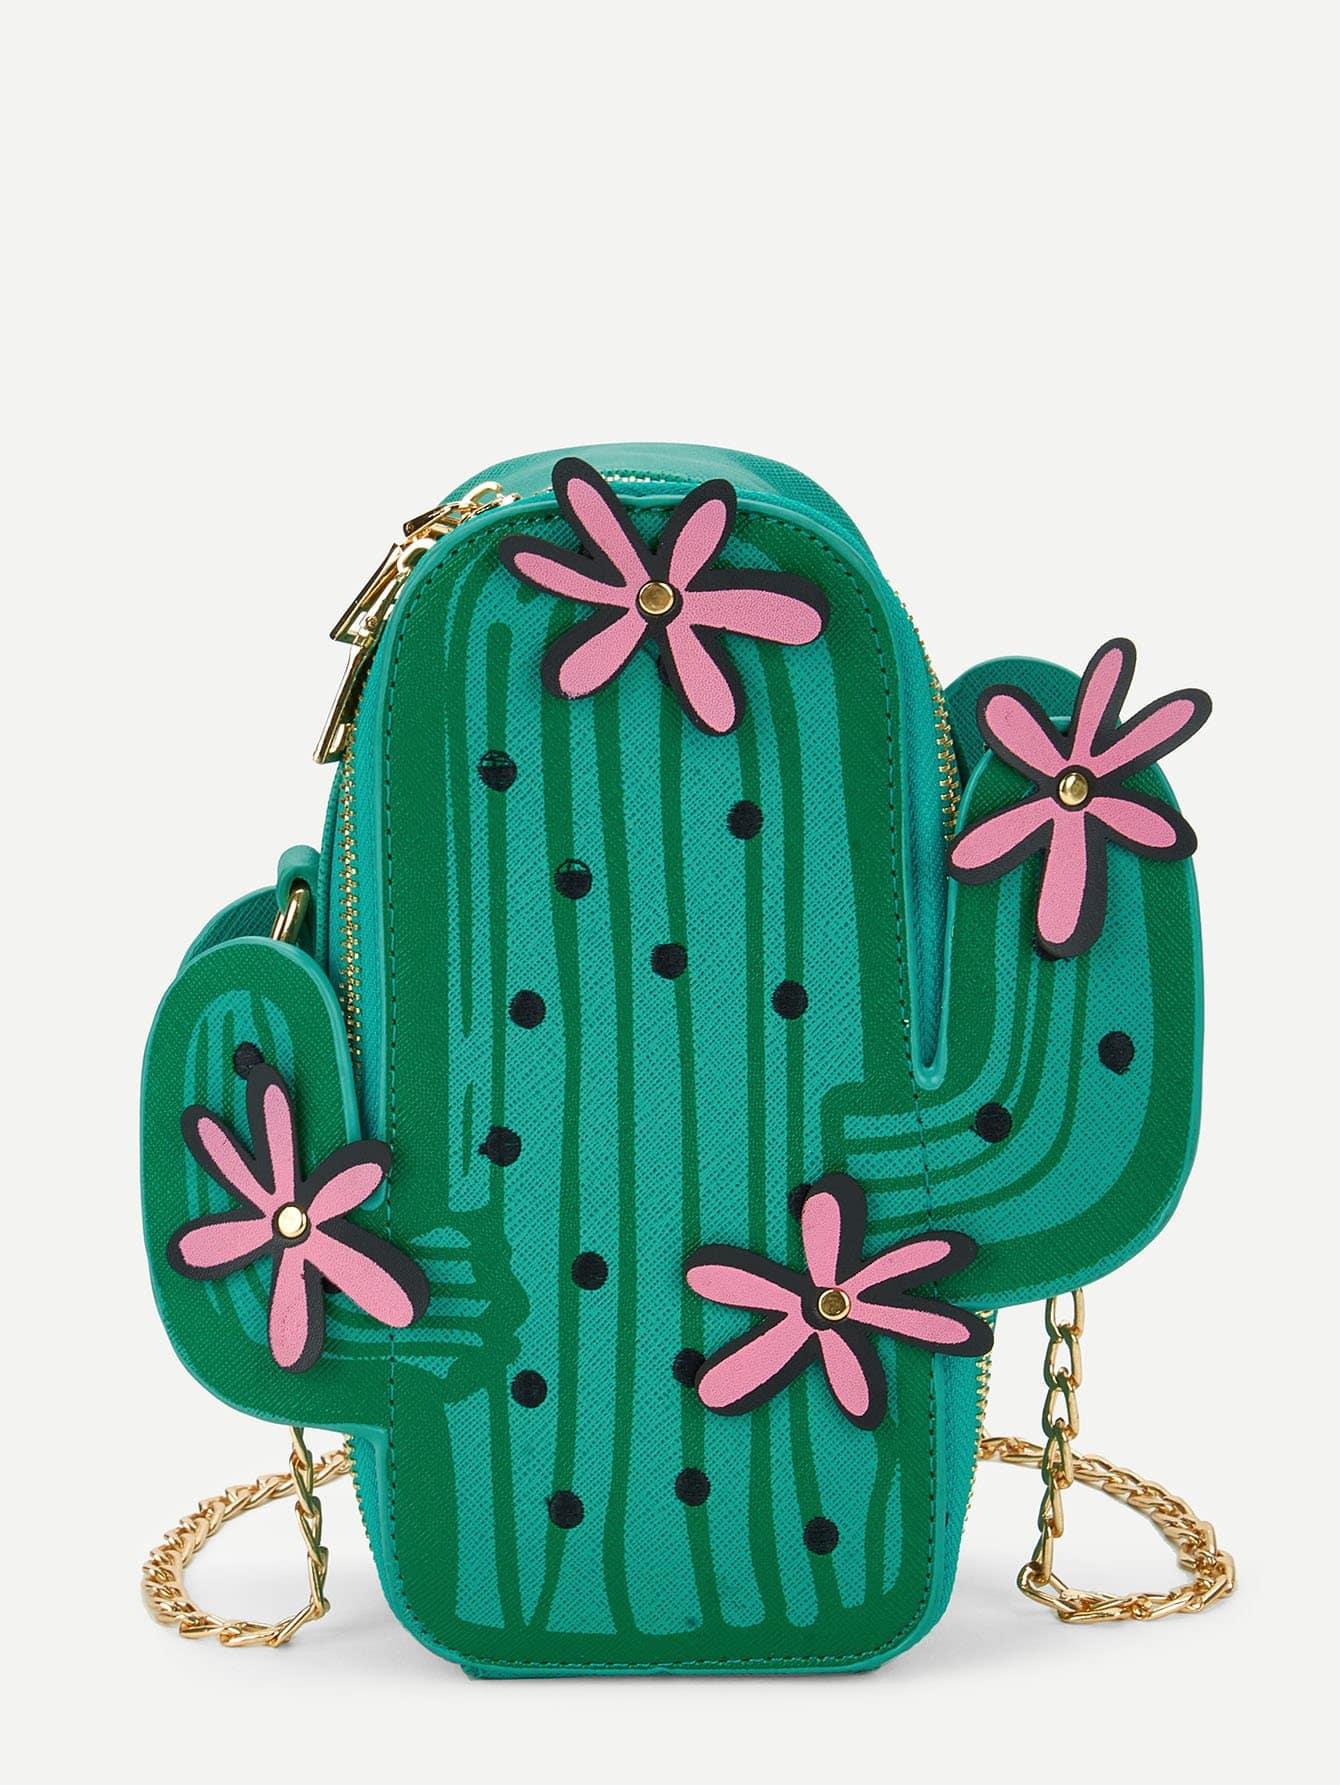 Les Filles De Cactus De La Chaîne De Conception De Sac